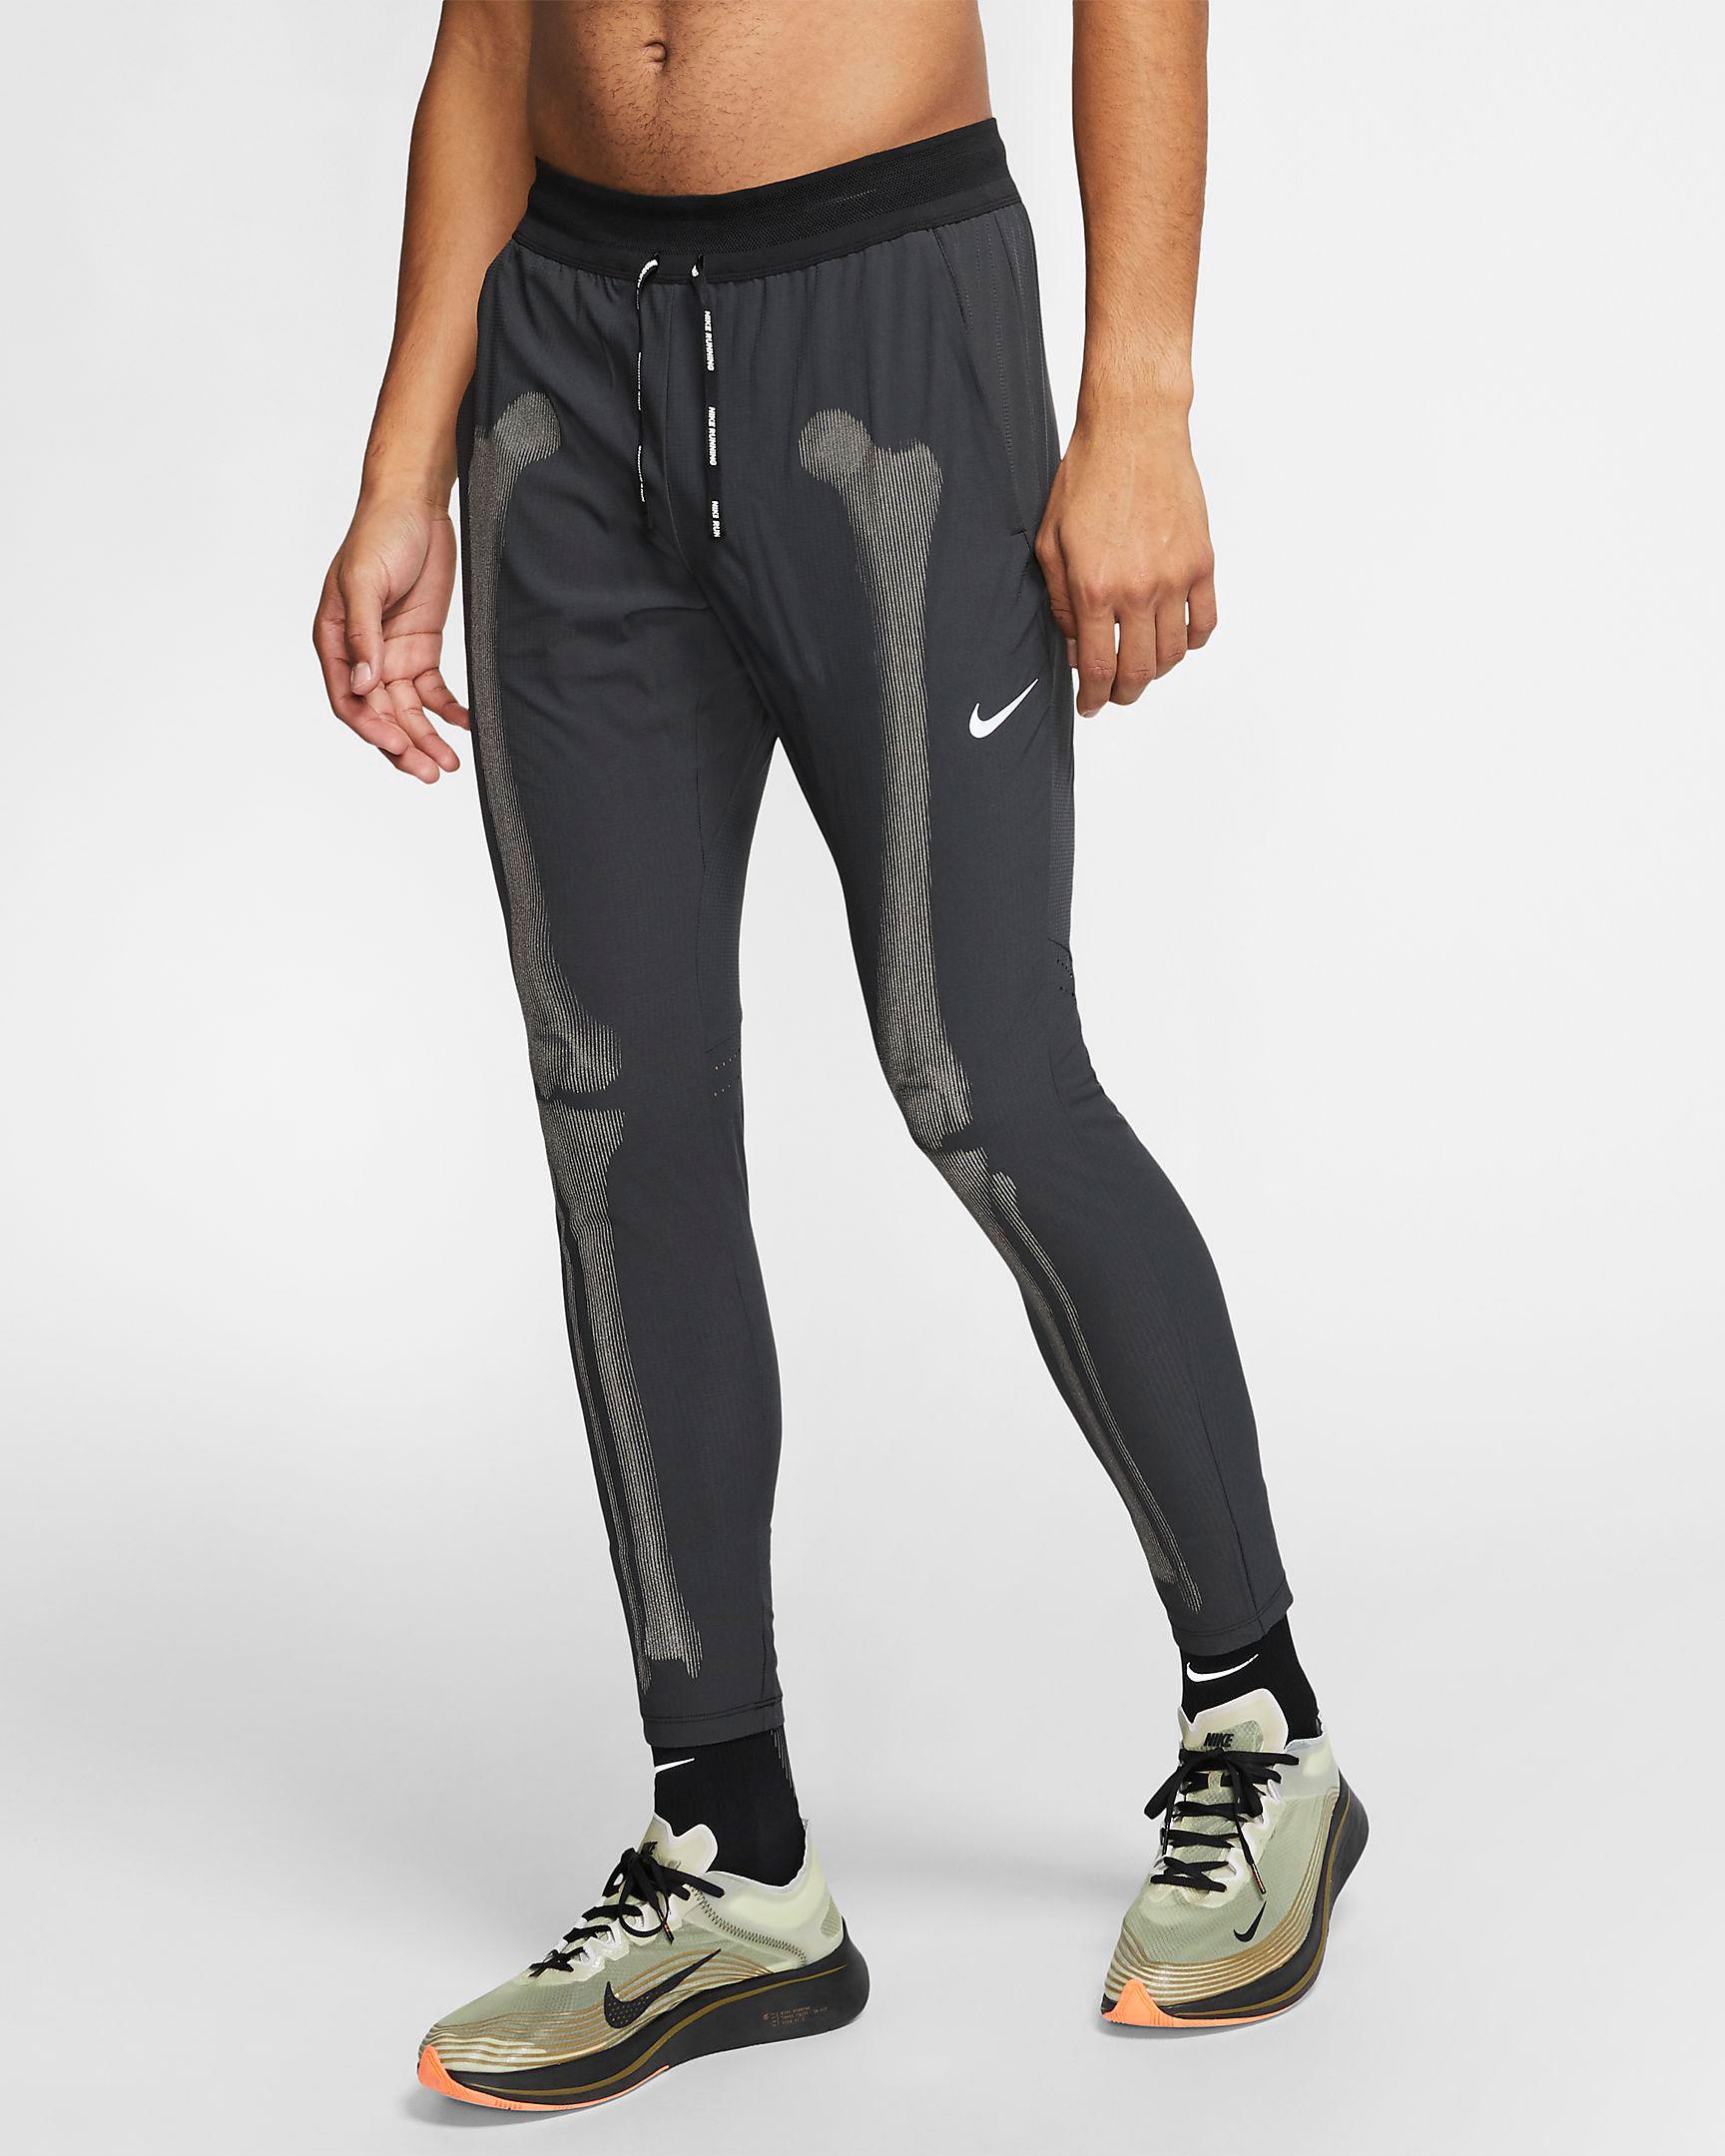 nike-black-skeleton-pants-1